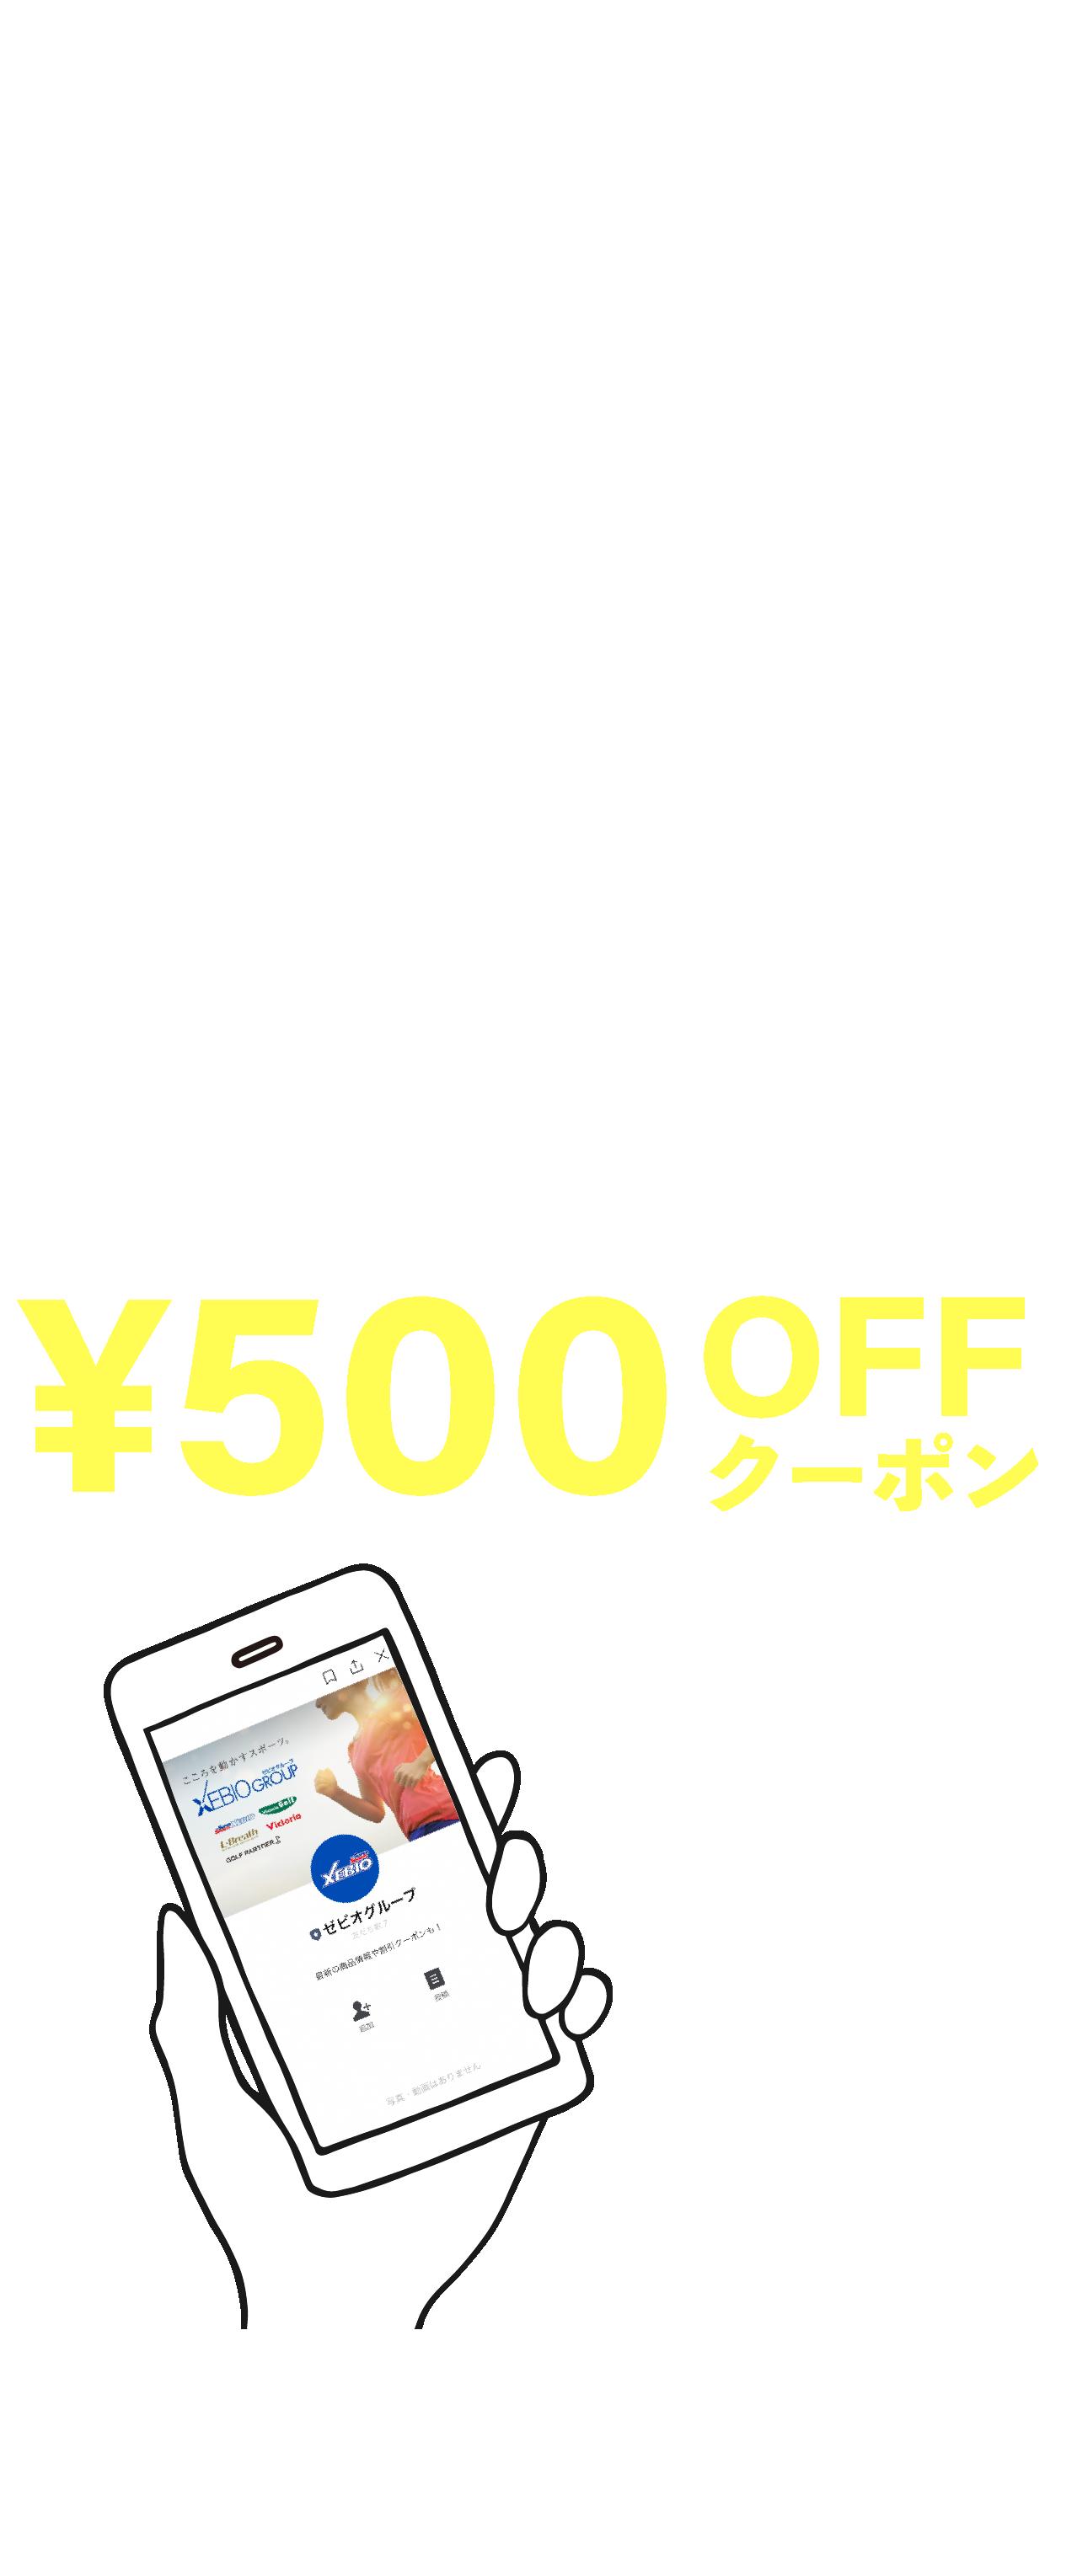 XEBIO GROUP LINE公式アカウント始めました! 今だけ!公式オンラインストア限定¥500 OFFクーポン